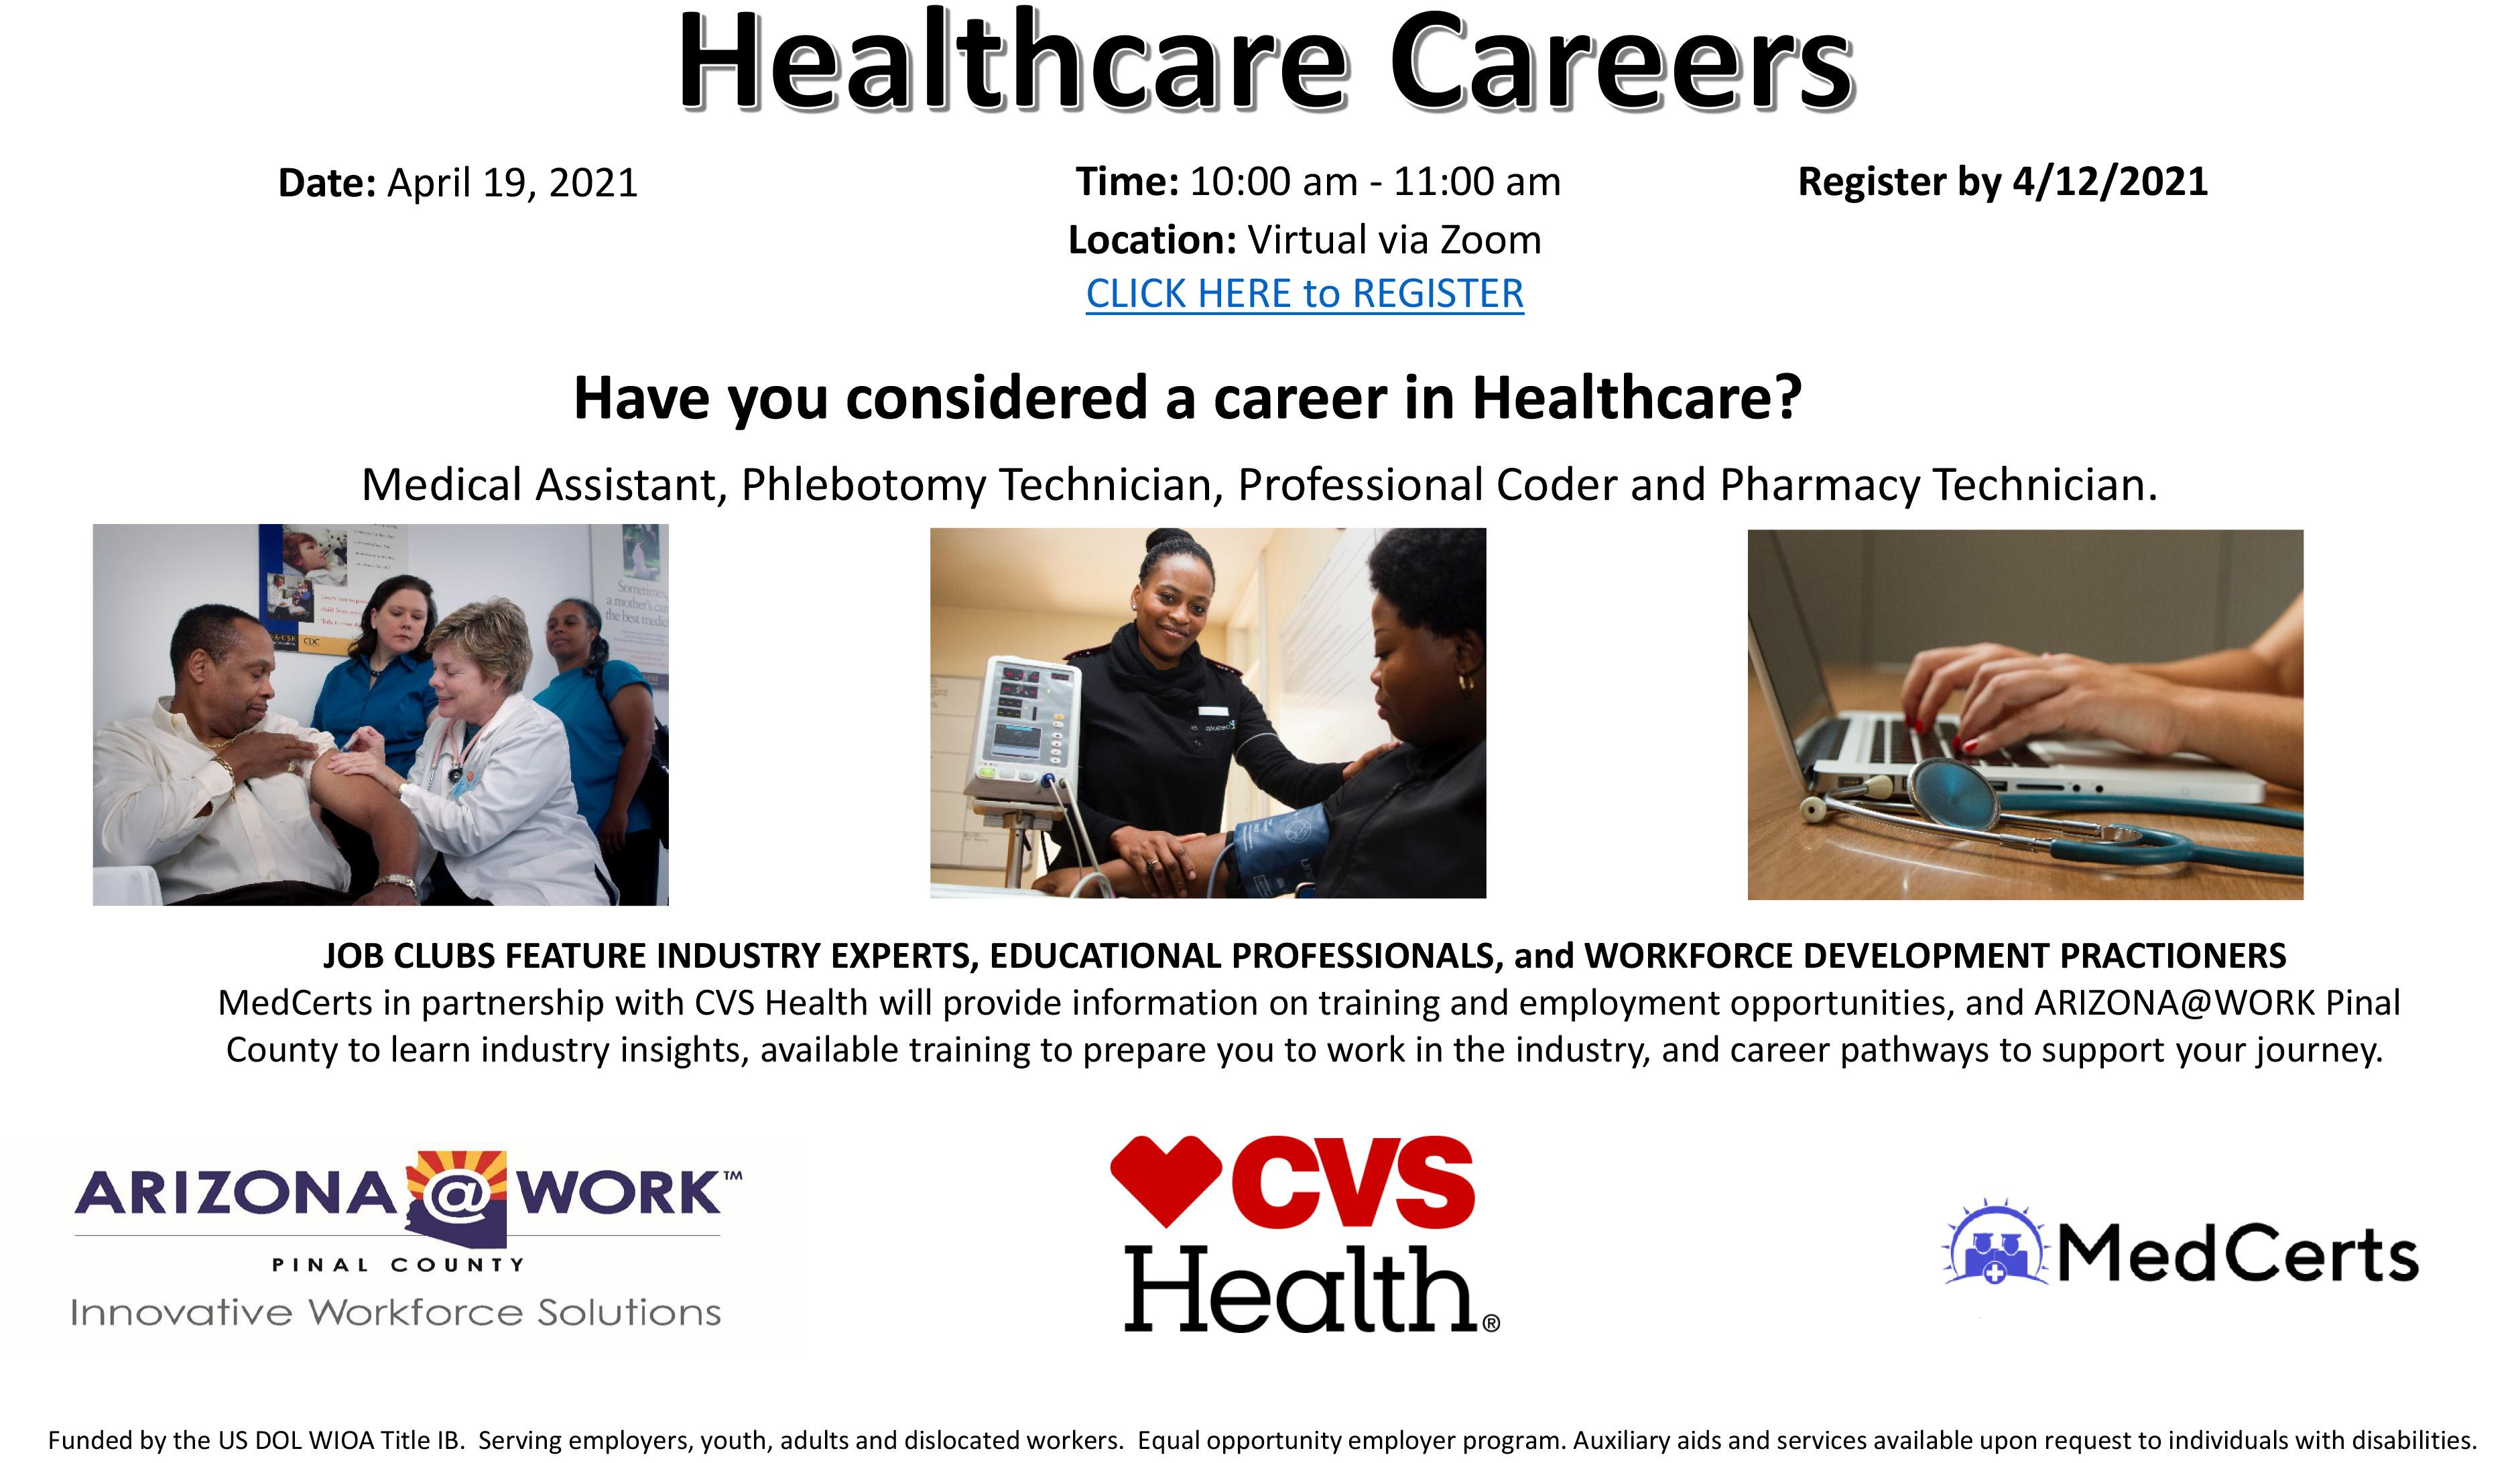 Health Services Job Club event